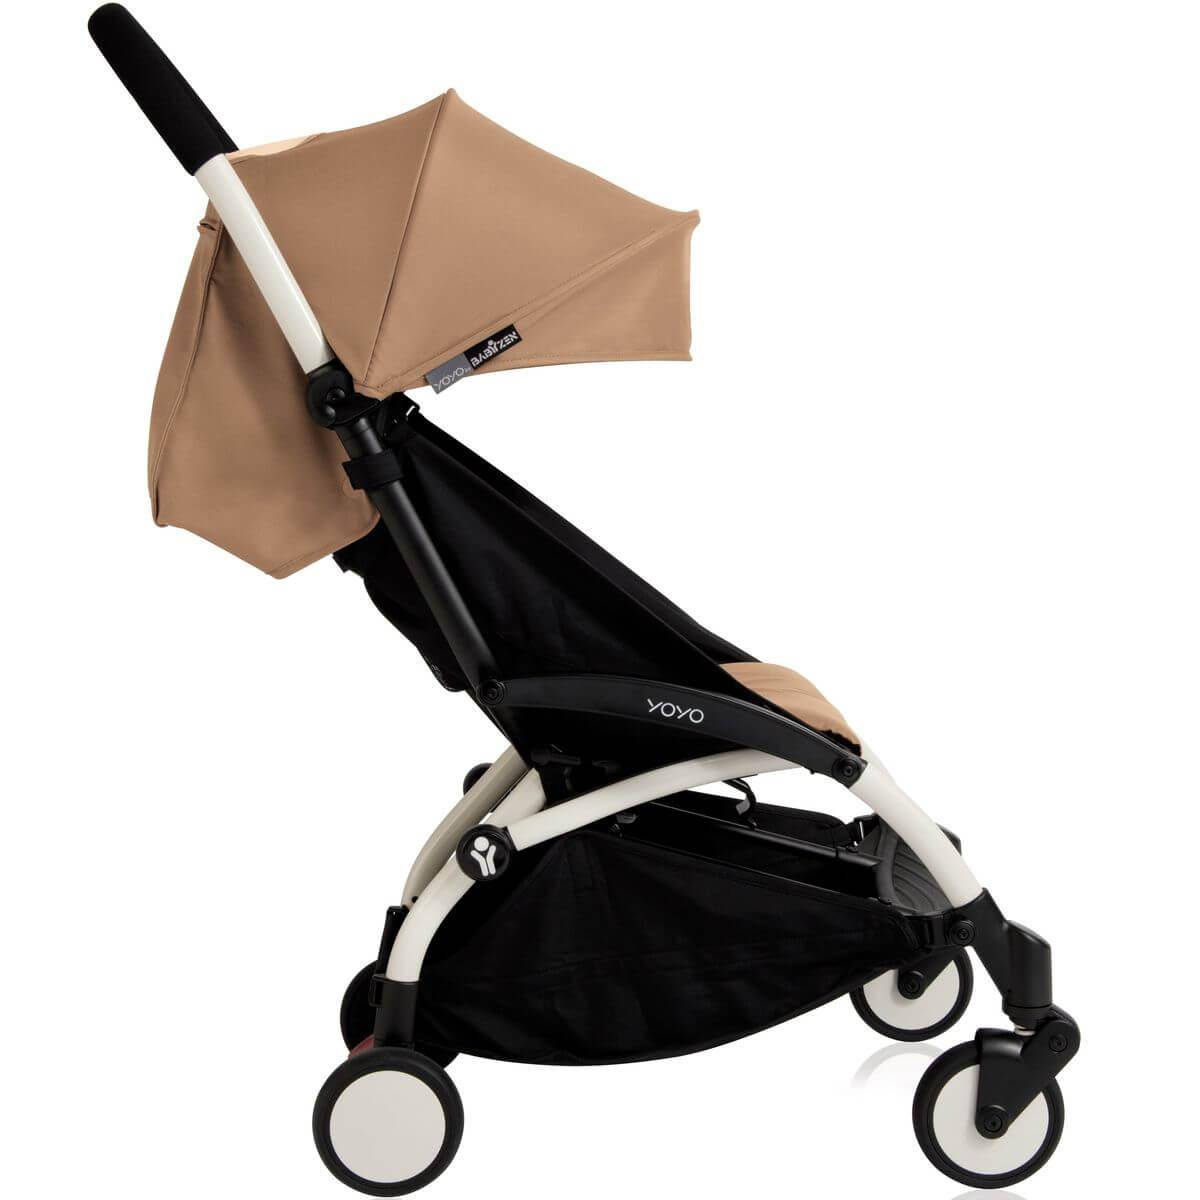 Silla paseo bebé YOYO+ 6+ Babyzen blanco-taupe